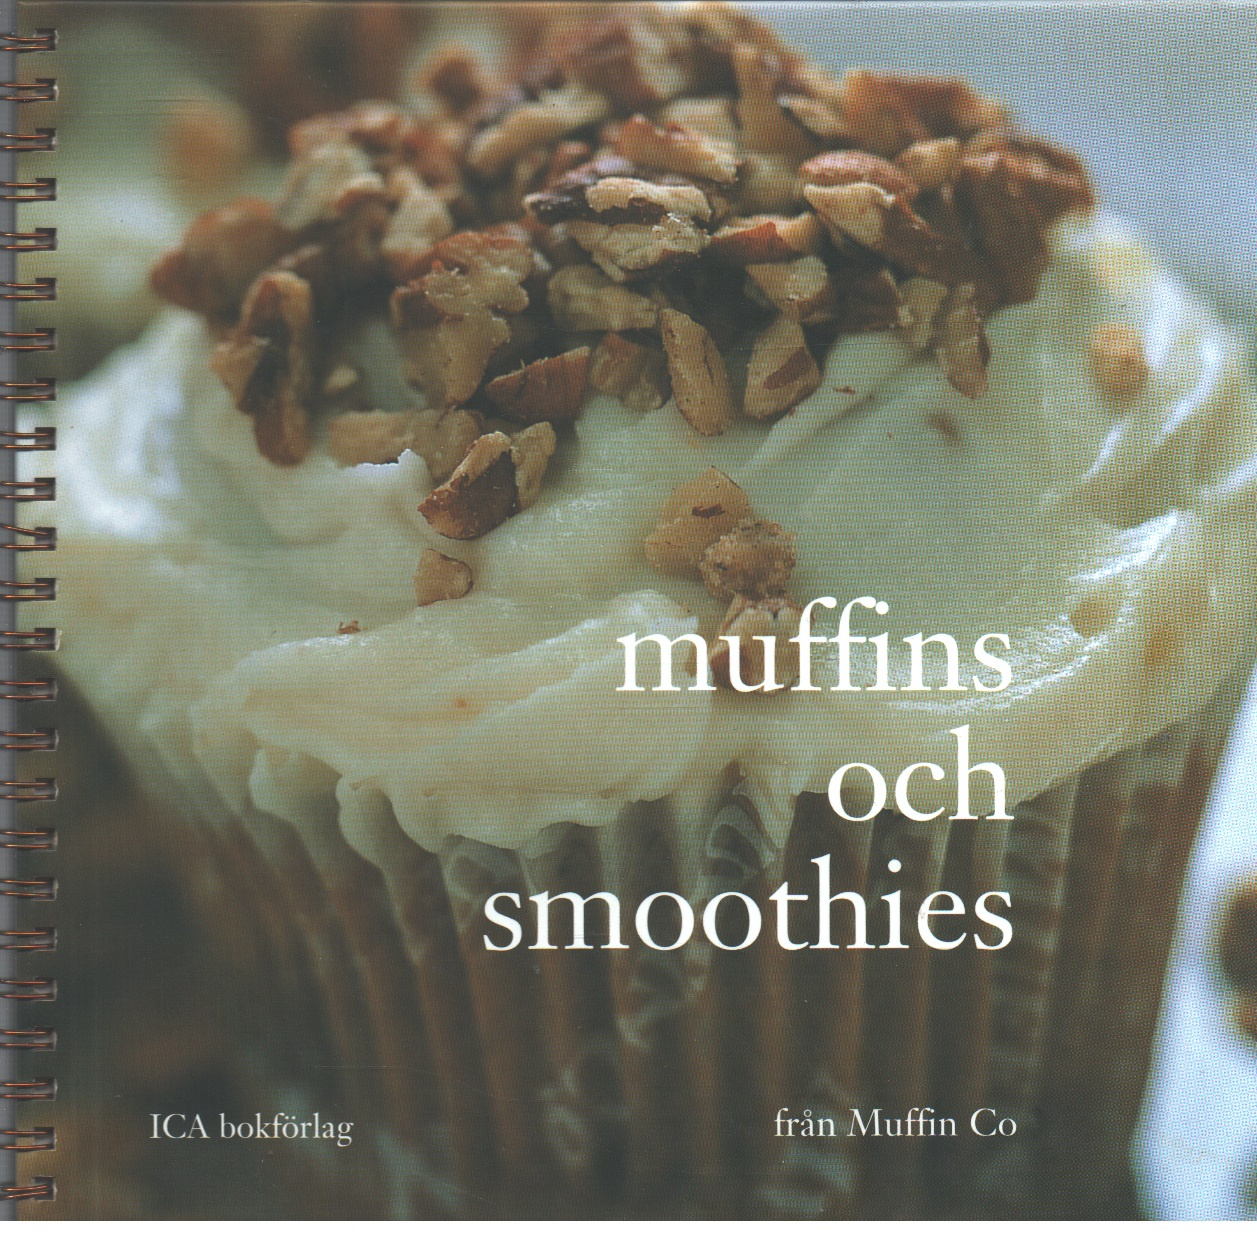 Muffins och smoothies - Lindblad, Cheryl